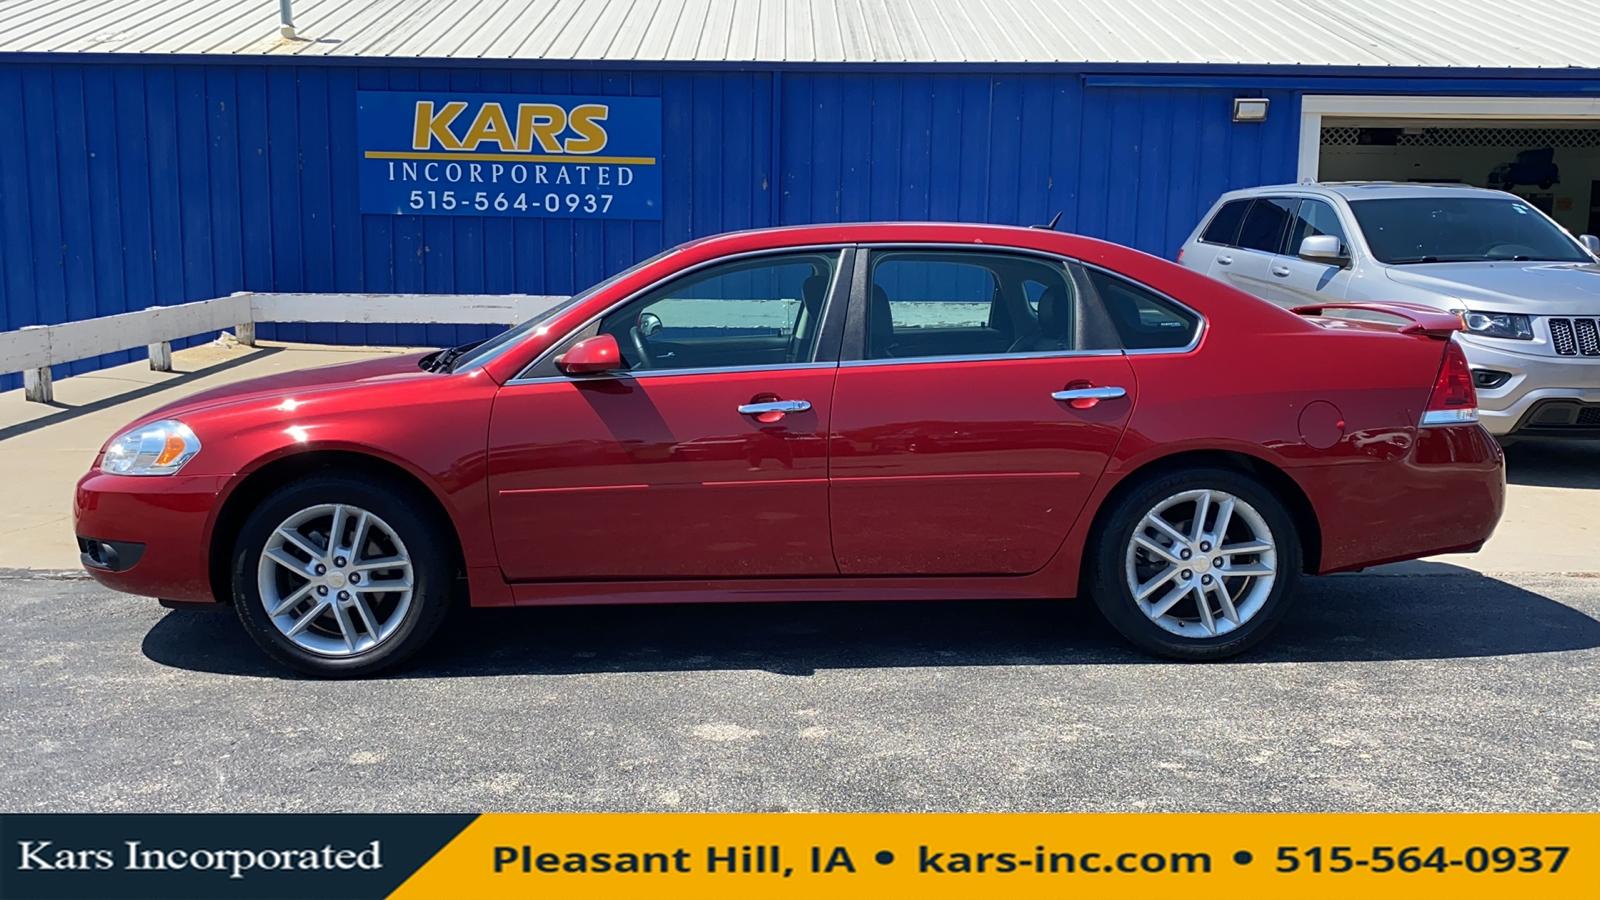 2014 Chevrolet Impala Limited LTZ  - E52079P  - Kars Incorporated